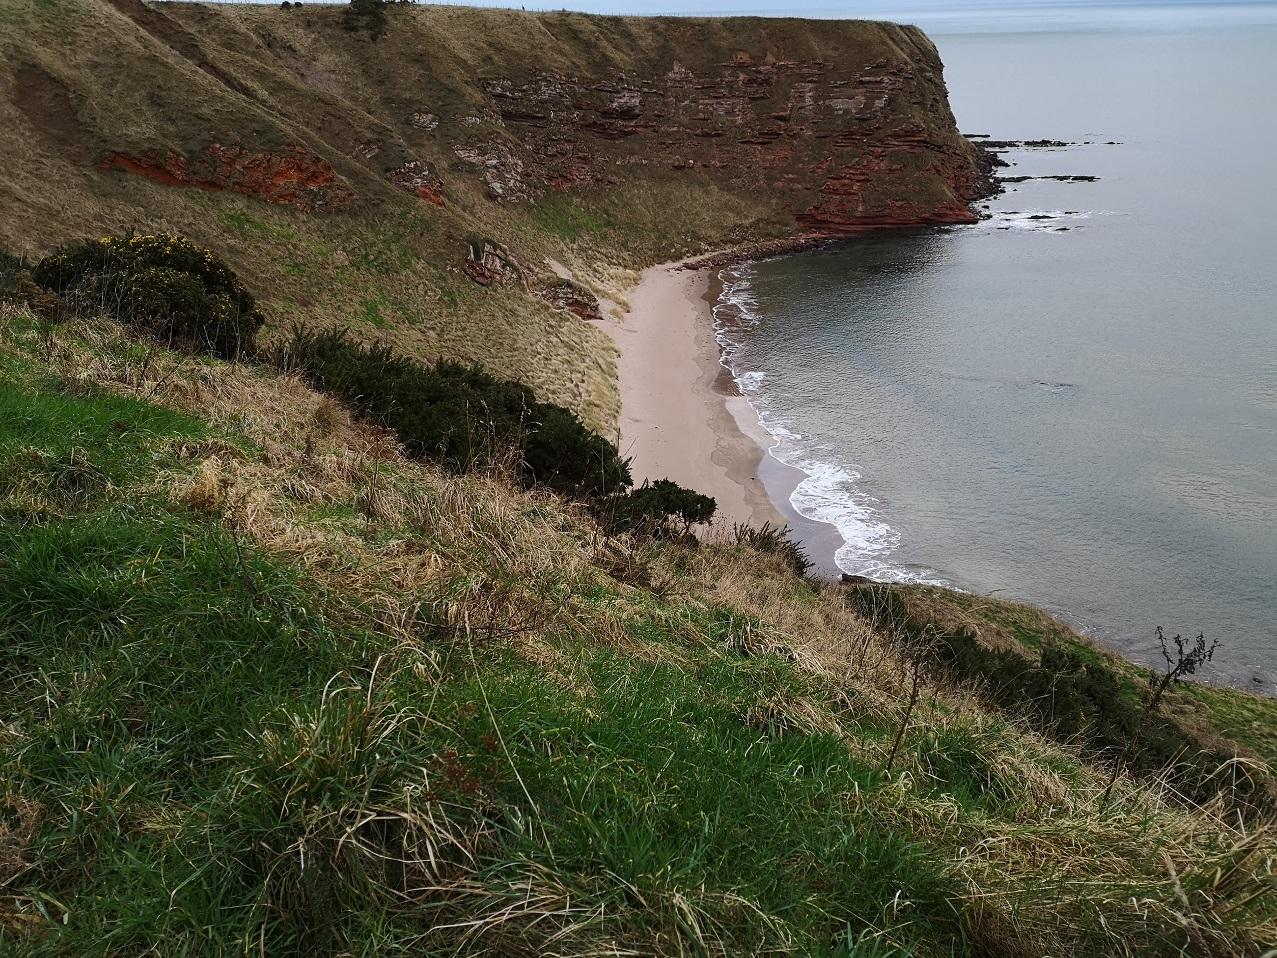 Beach cusps link to Coastal Wiki